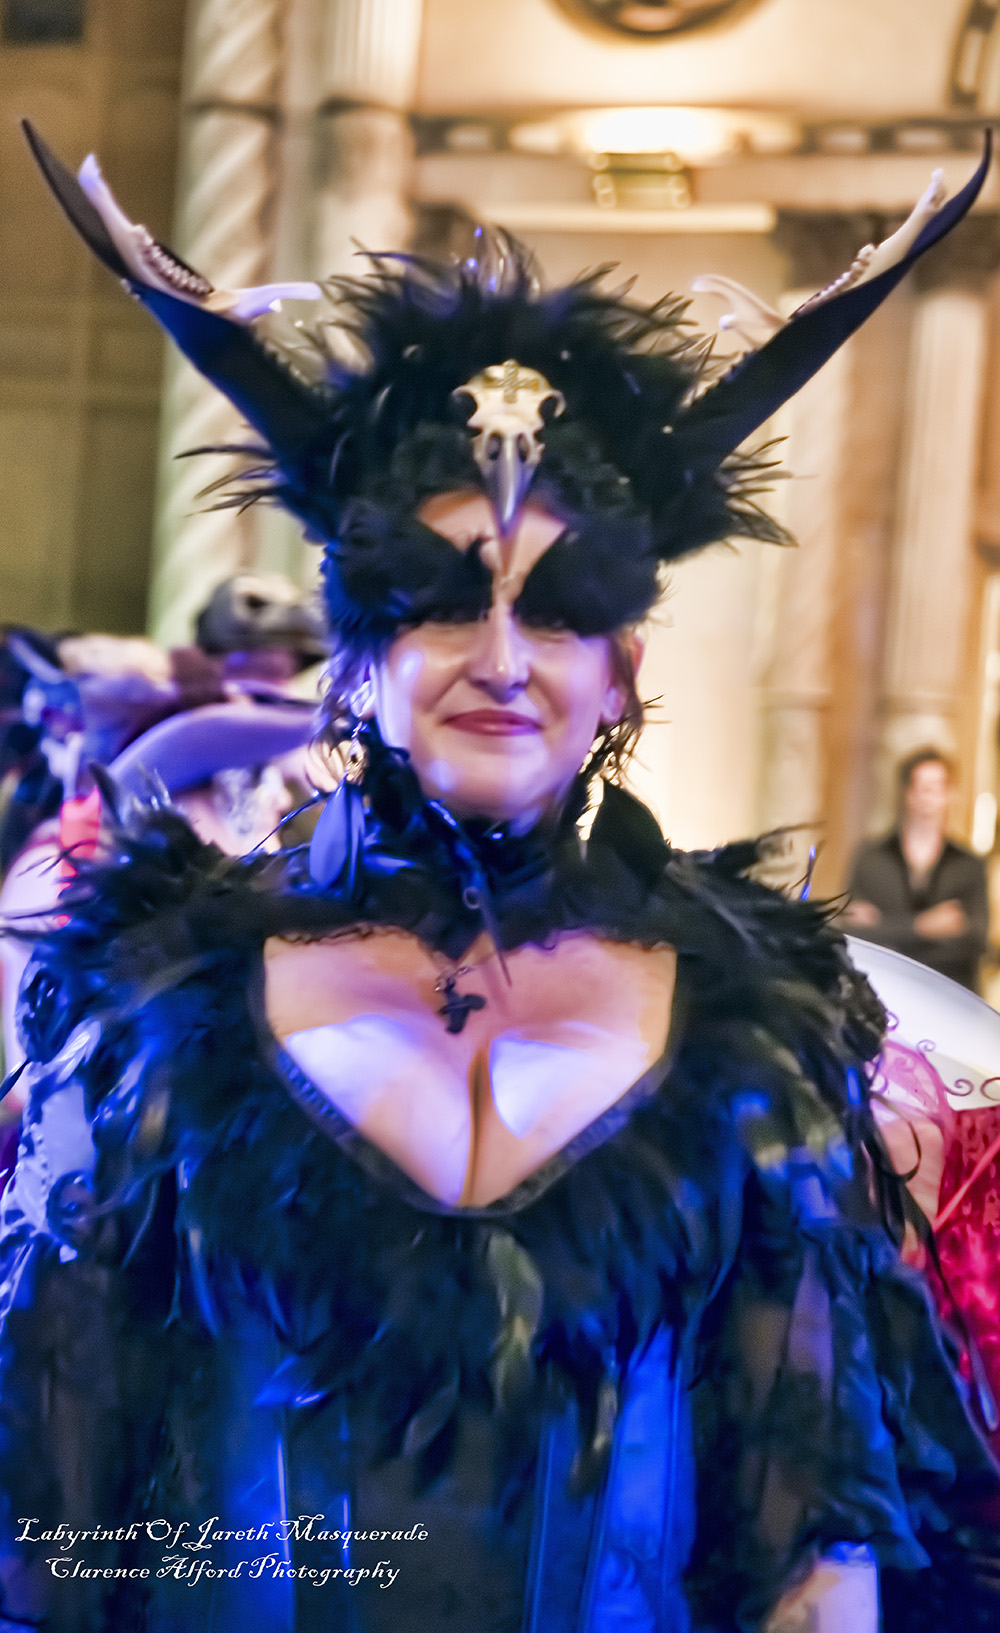 labyrinth_masquerade_201705040219